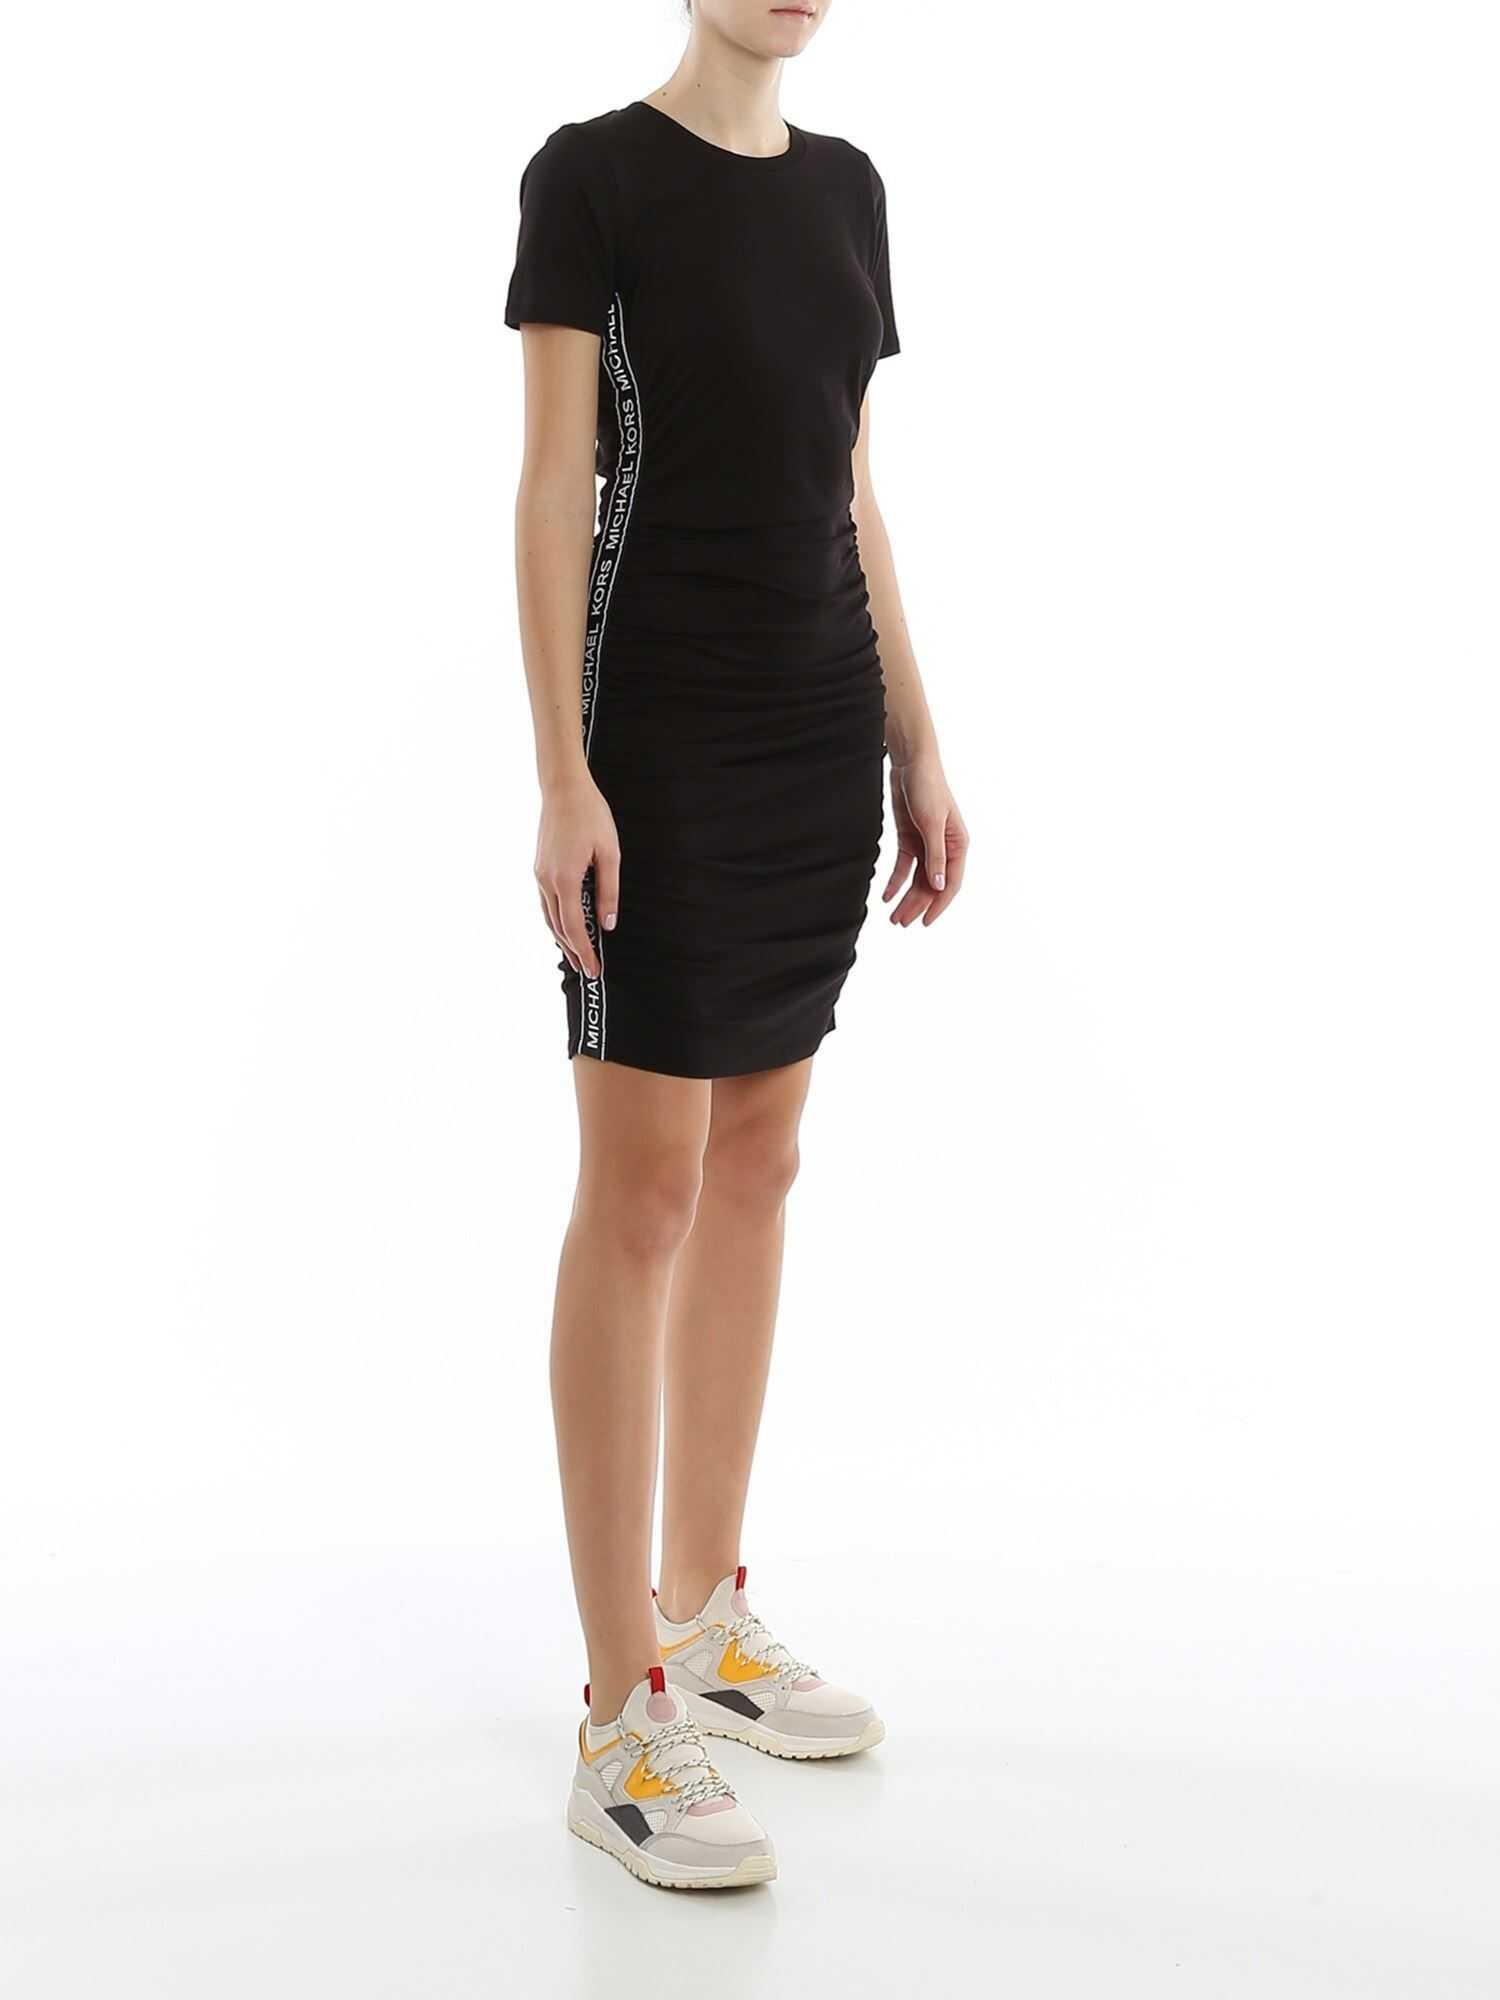 Michael Kors Logo Stripe Short Dress Black